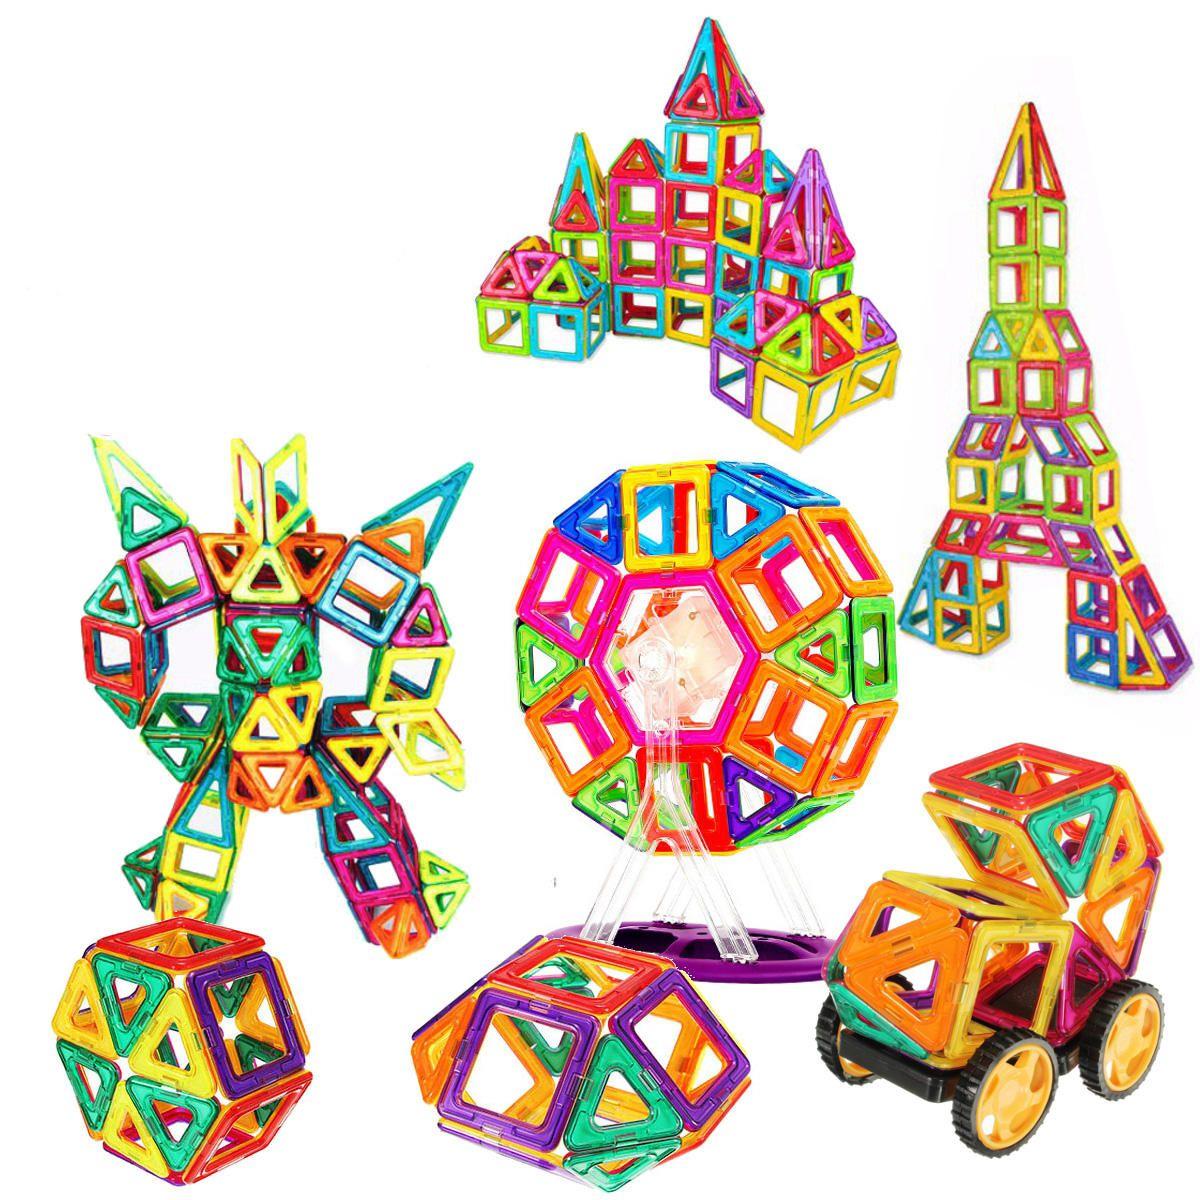 54Pcs 3D DIY Magnetic Bricks Building Blocks Kids Educational Toys